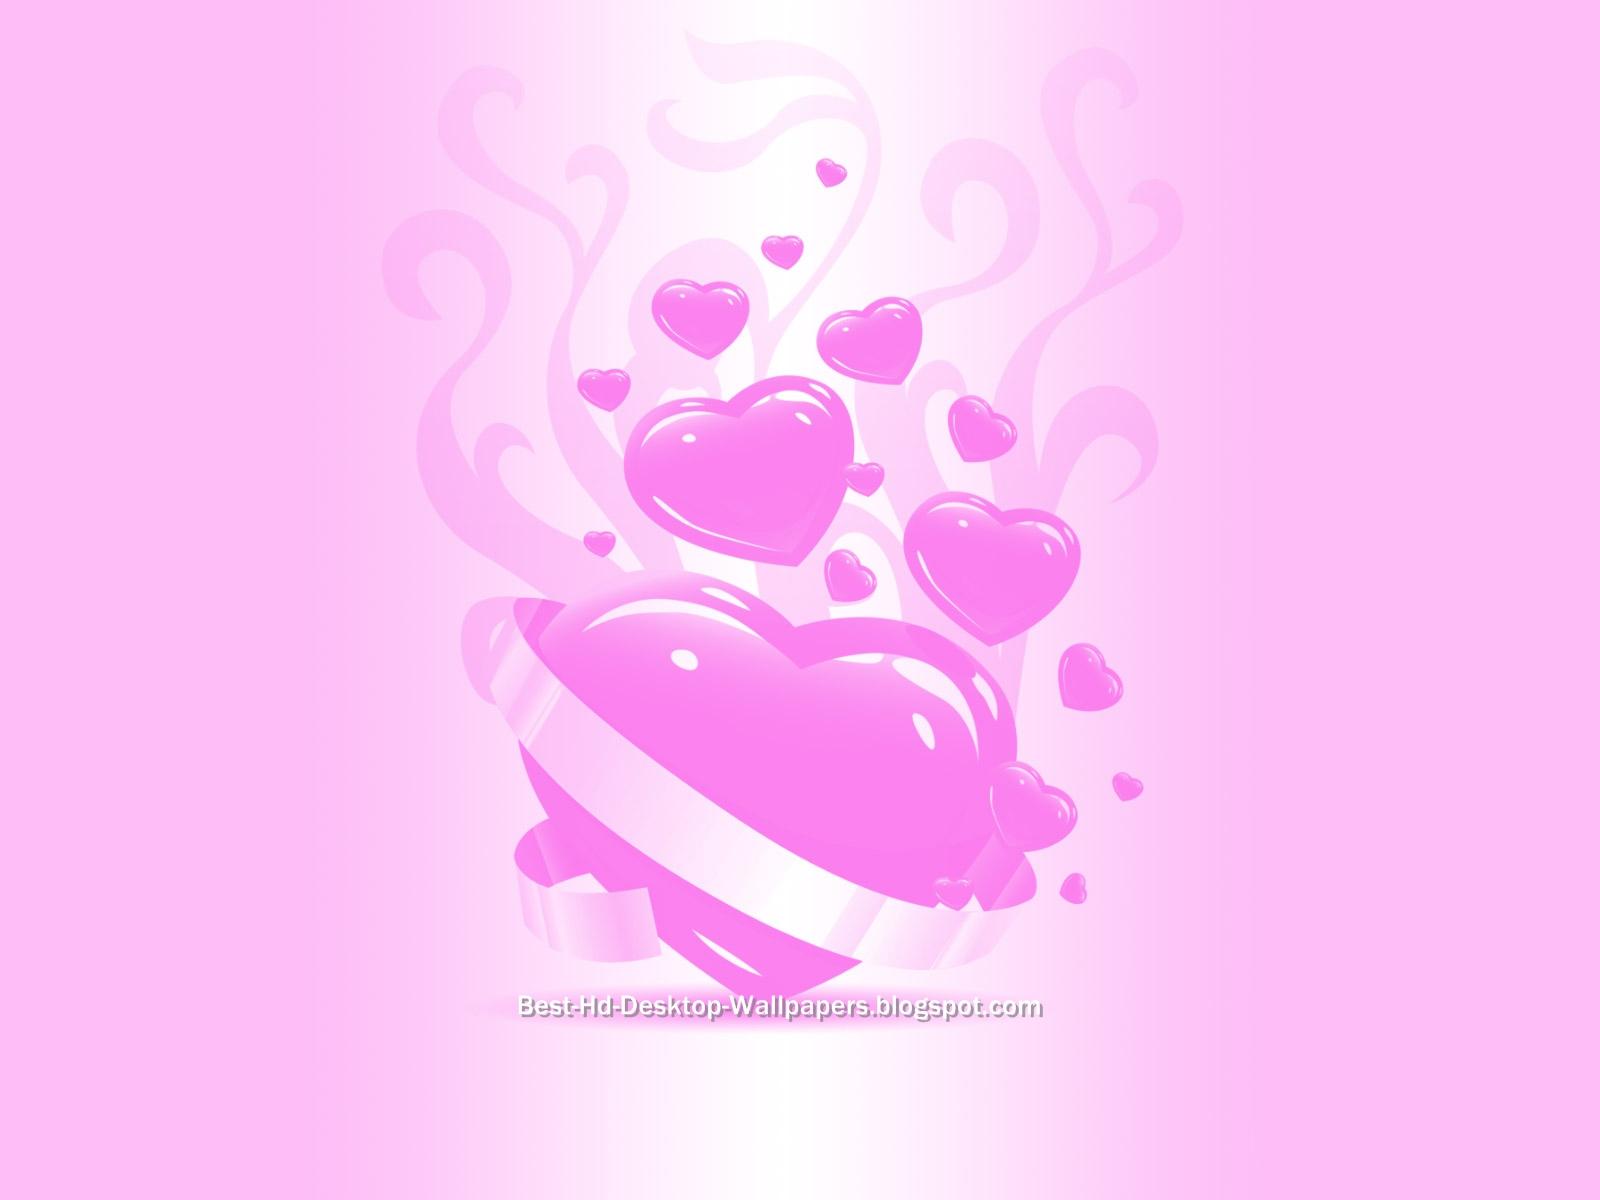 Pink Desktop wallpapers Pink Wallpaper cute pink wallpaper pink 1600x1200